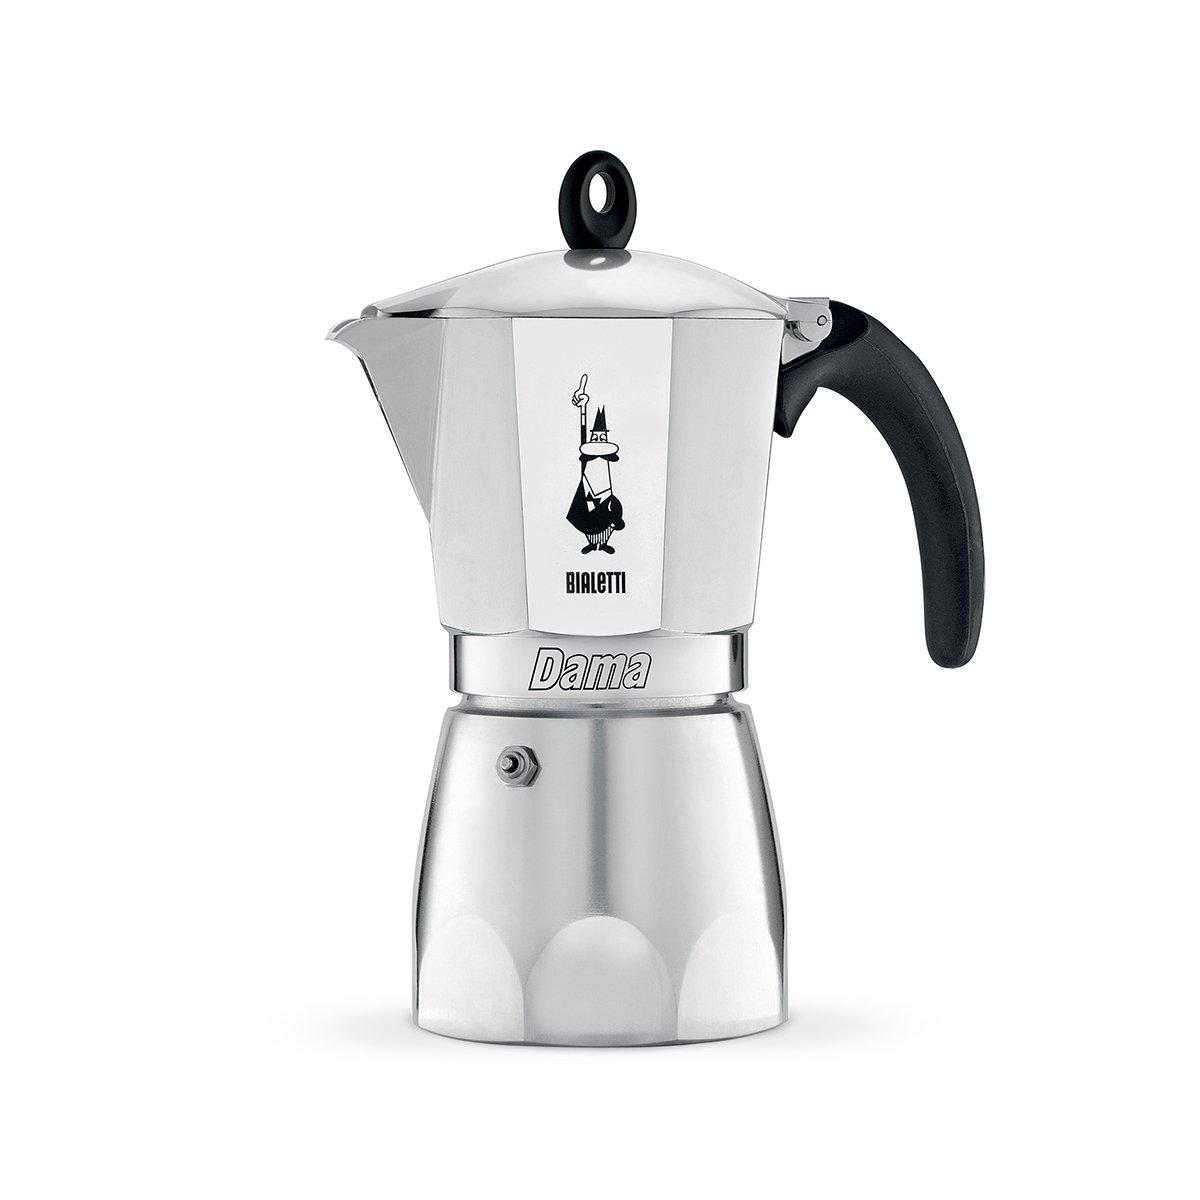 Bialetti Dama, cafetera de Aluminio, 9 Tazas: Amazon.es: Hogar